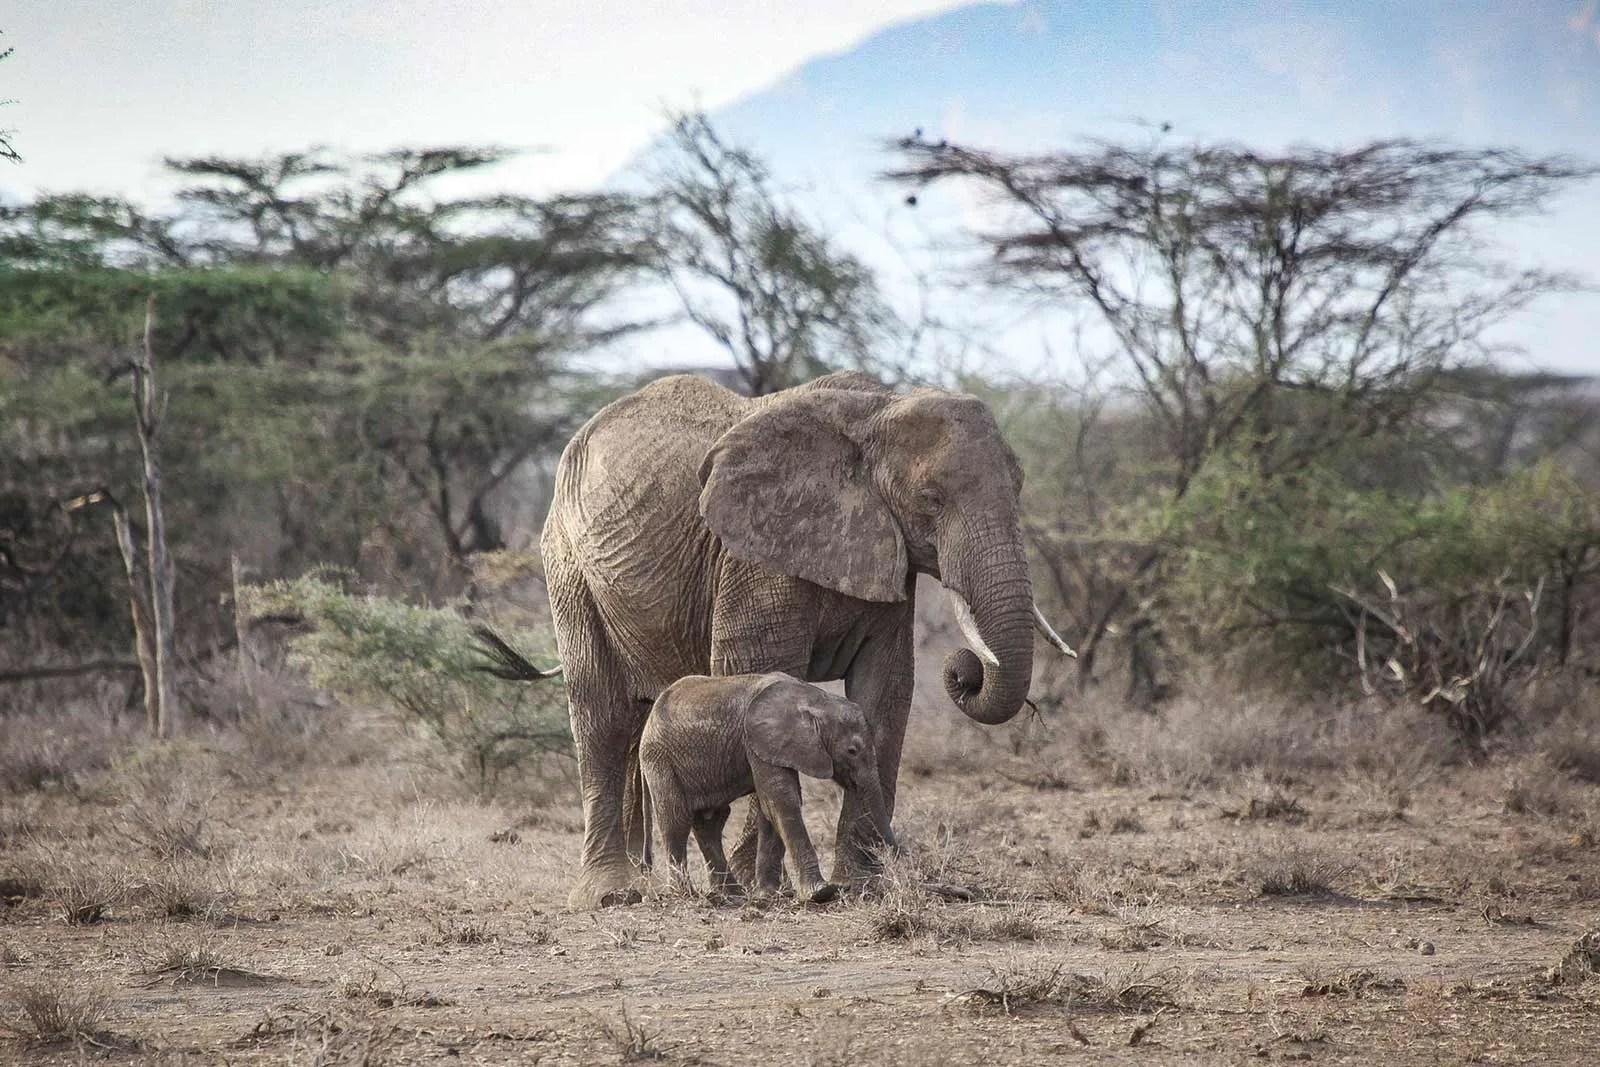 African elephant (Loxodonta africana) in uganda